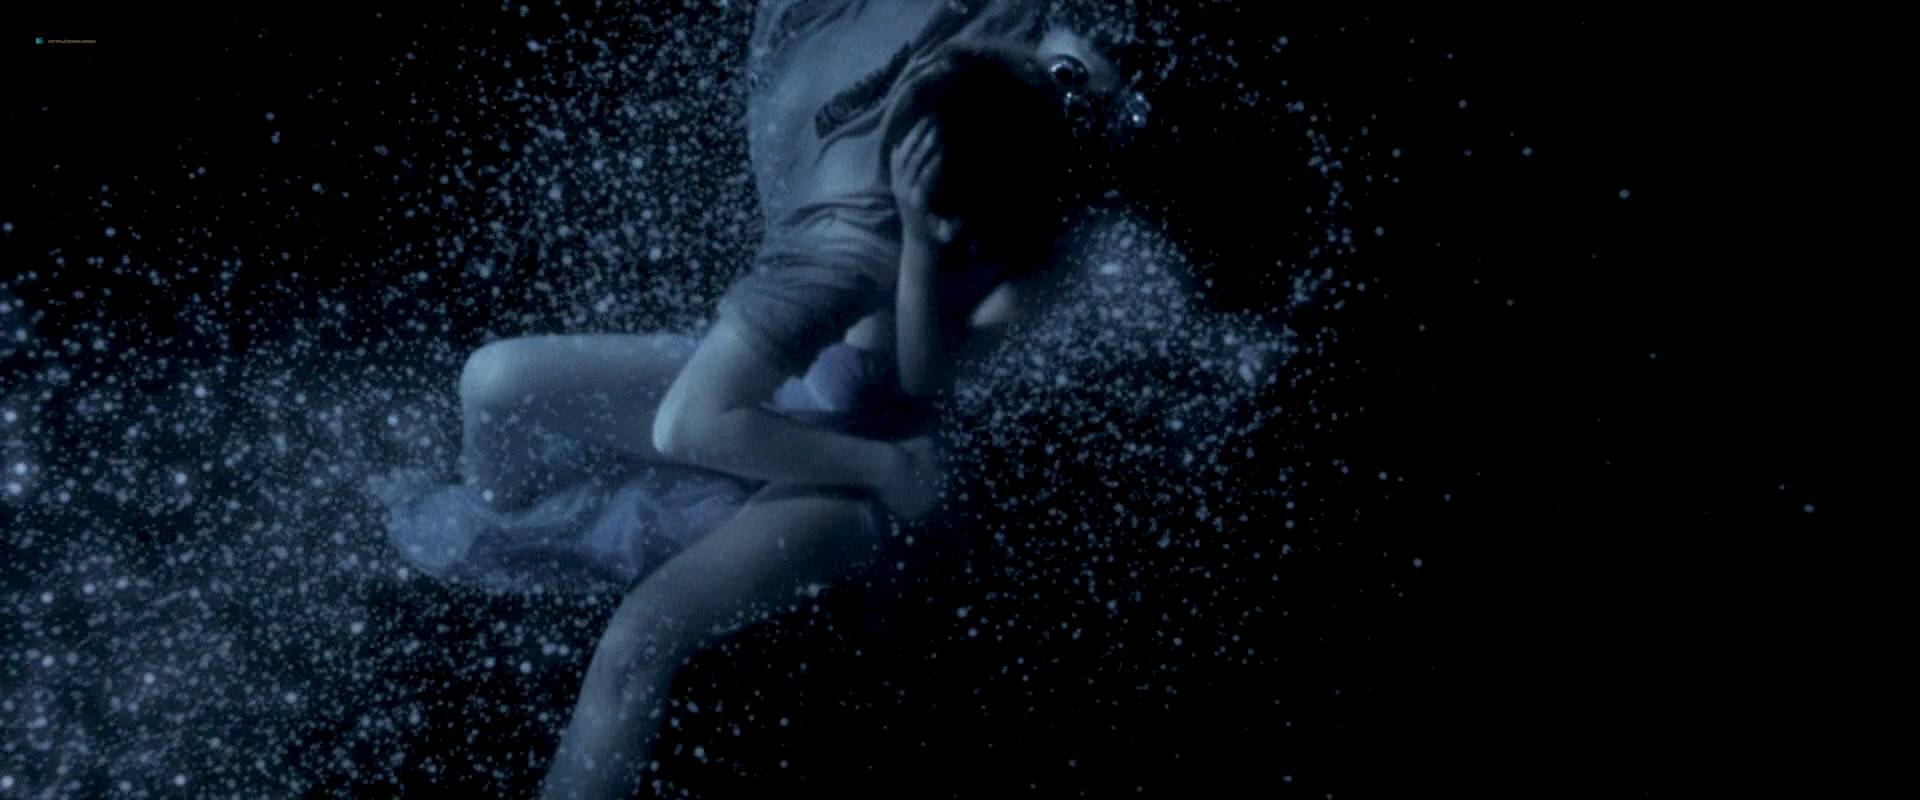 Virginie Ledoyen nude topless Tilda Swinton hot sex - The Beach (2000) HD 1080p BluRay (11)